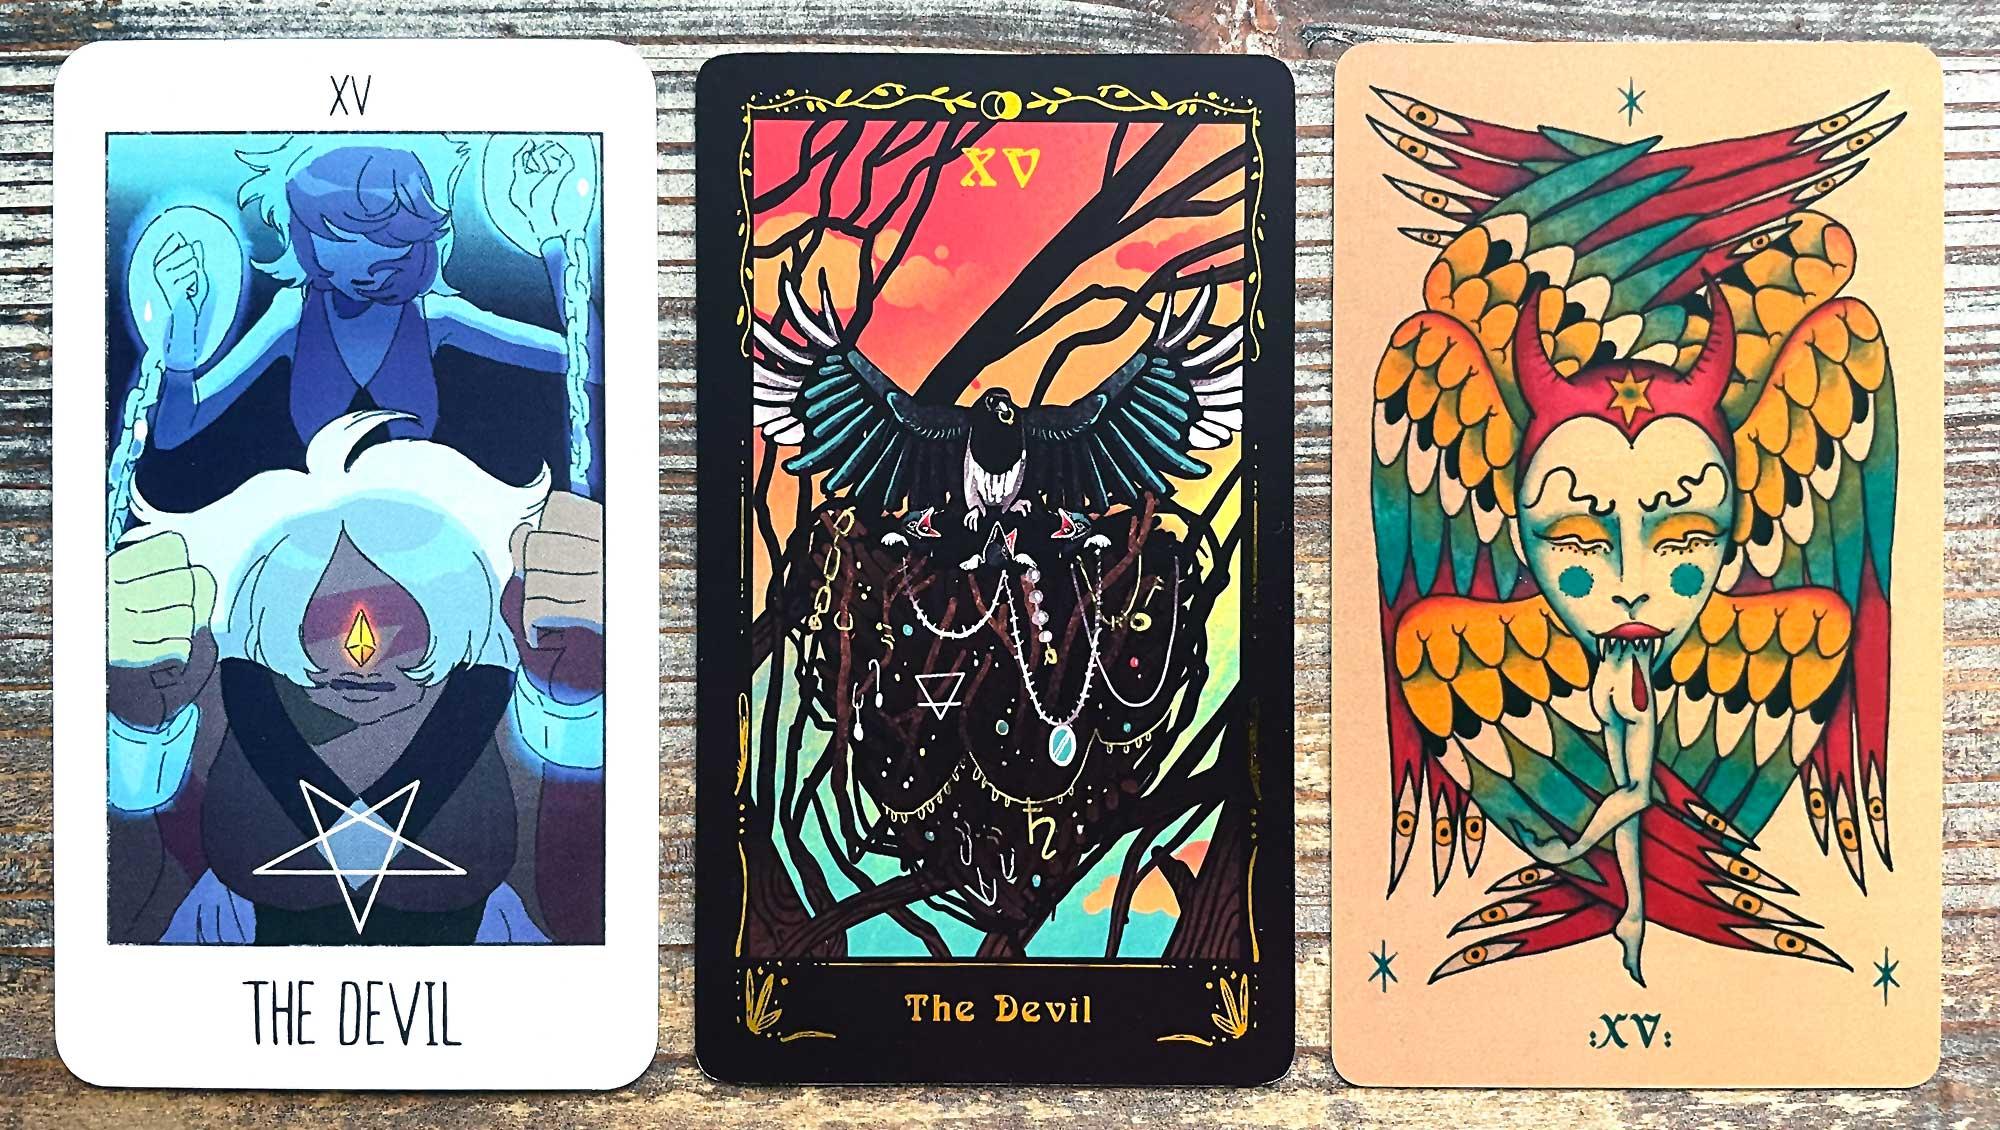 Steven Universe Tarot, Occult Ornithology Tarot, Sortilegios Tarot